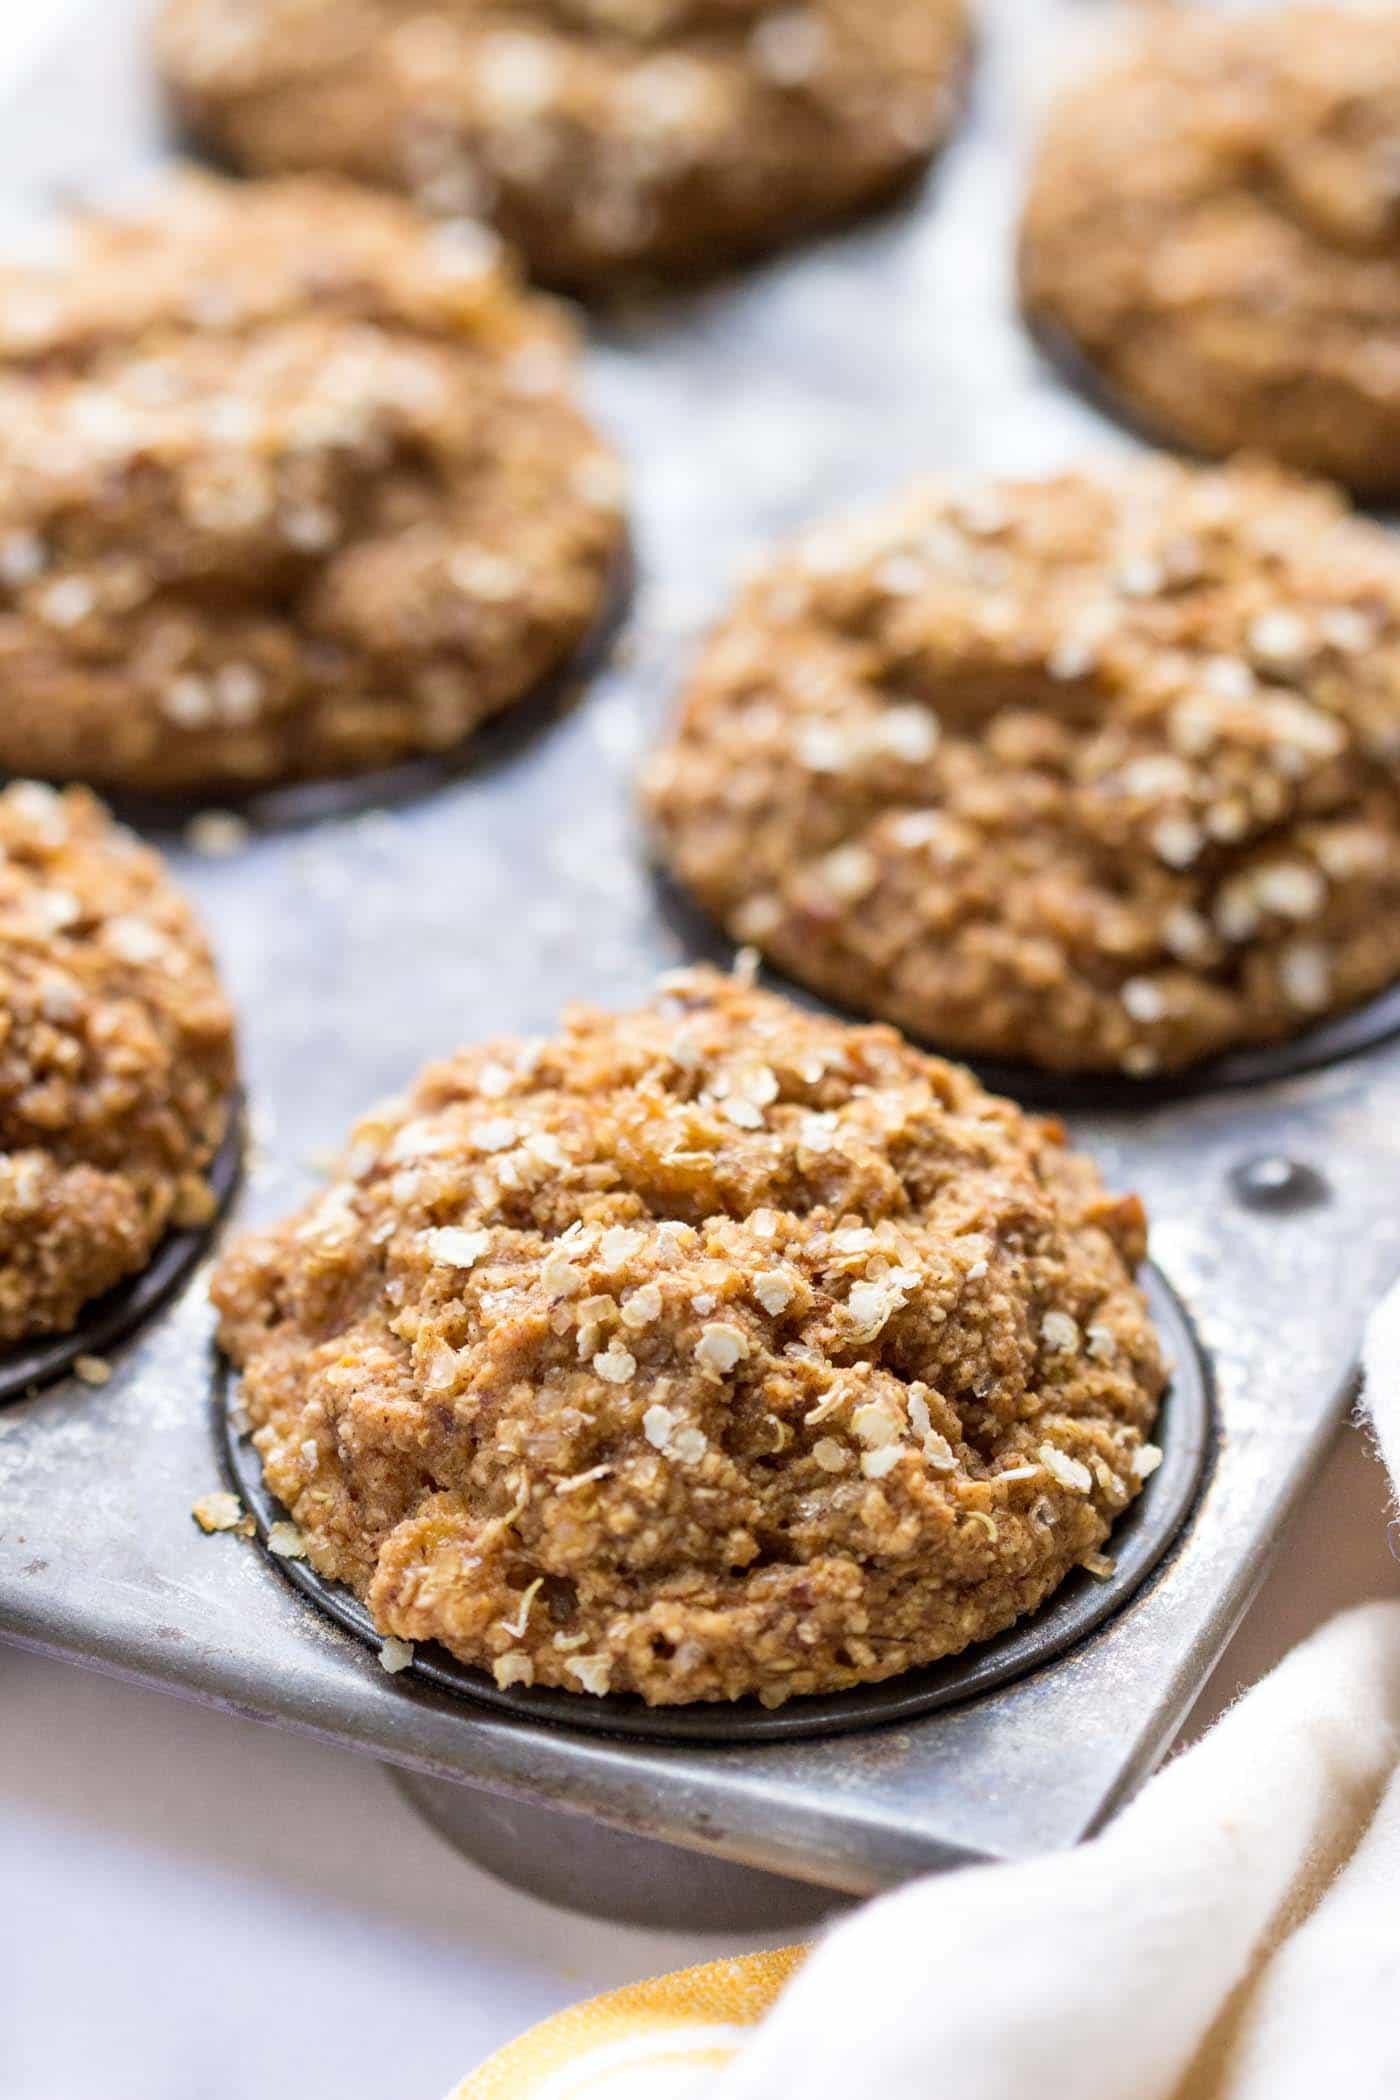 Spiced Quinoa Muffins with Coconut Yogurt